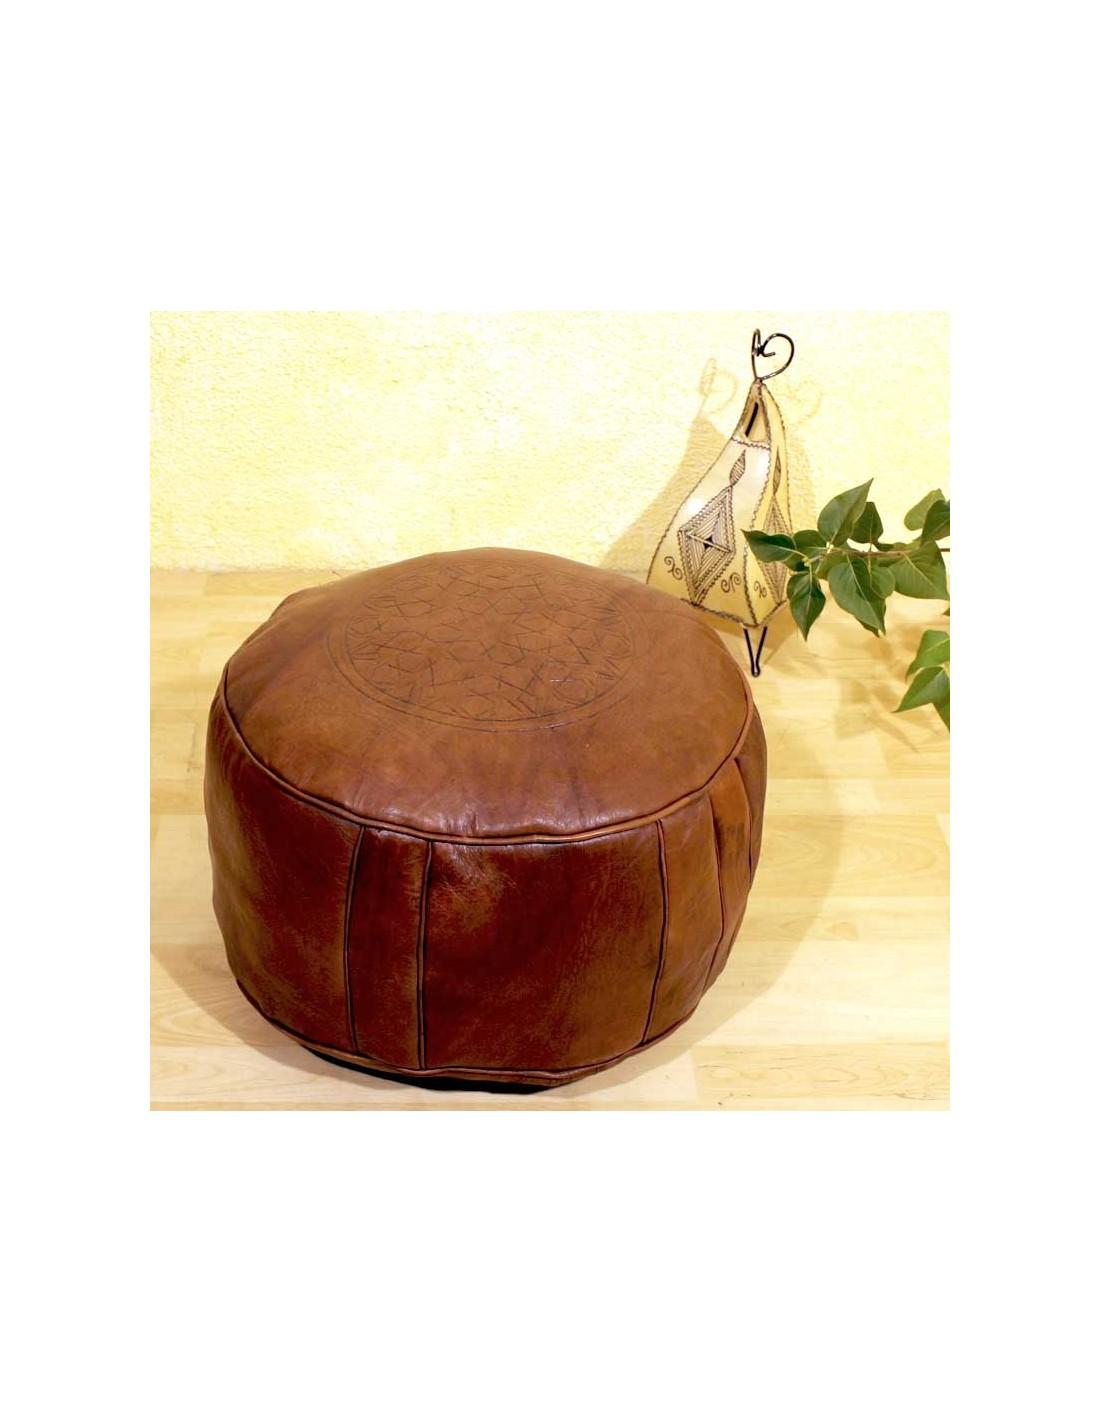 ledersitzkissen poufs tabaa braun 50cm albena marokko galerie. Black Bedroom Furniture Sets. Home Design Ideas